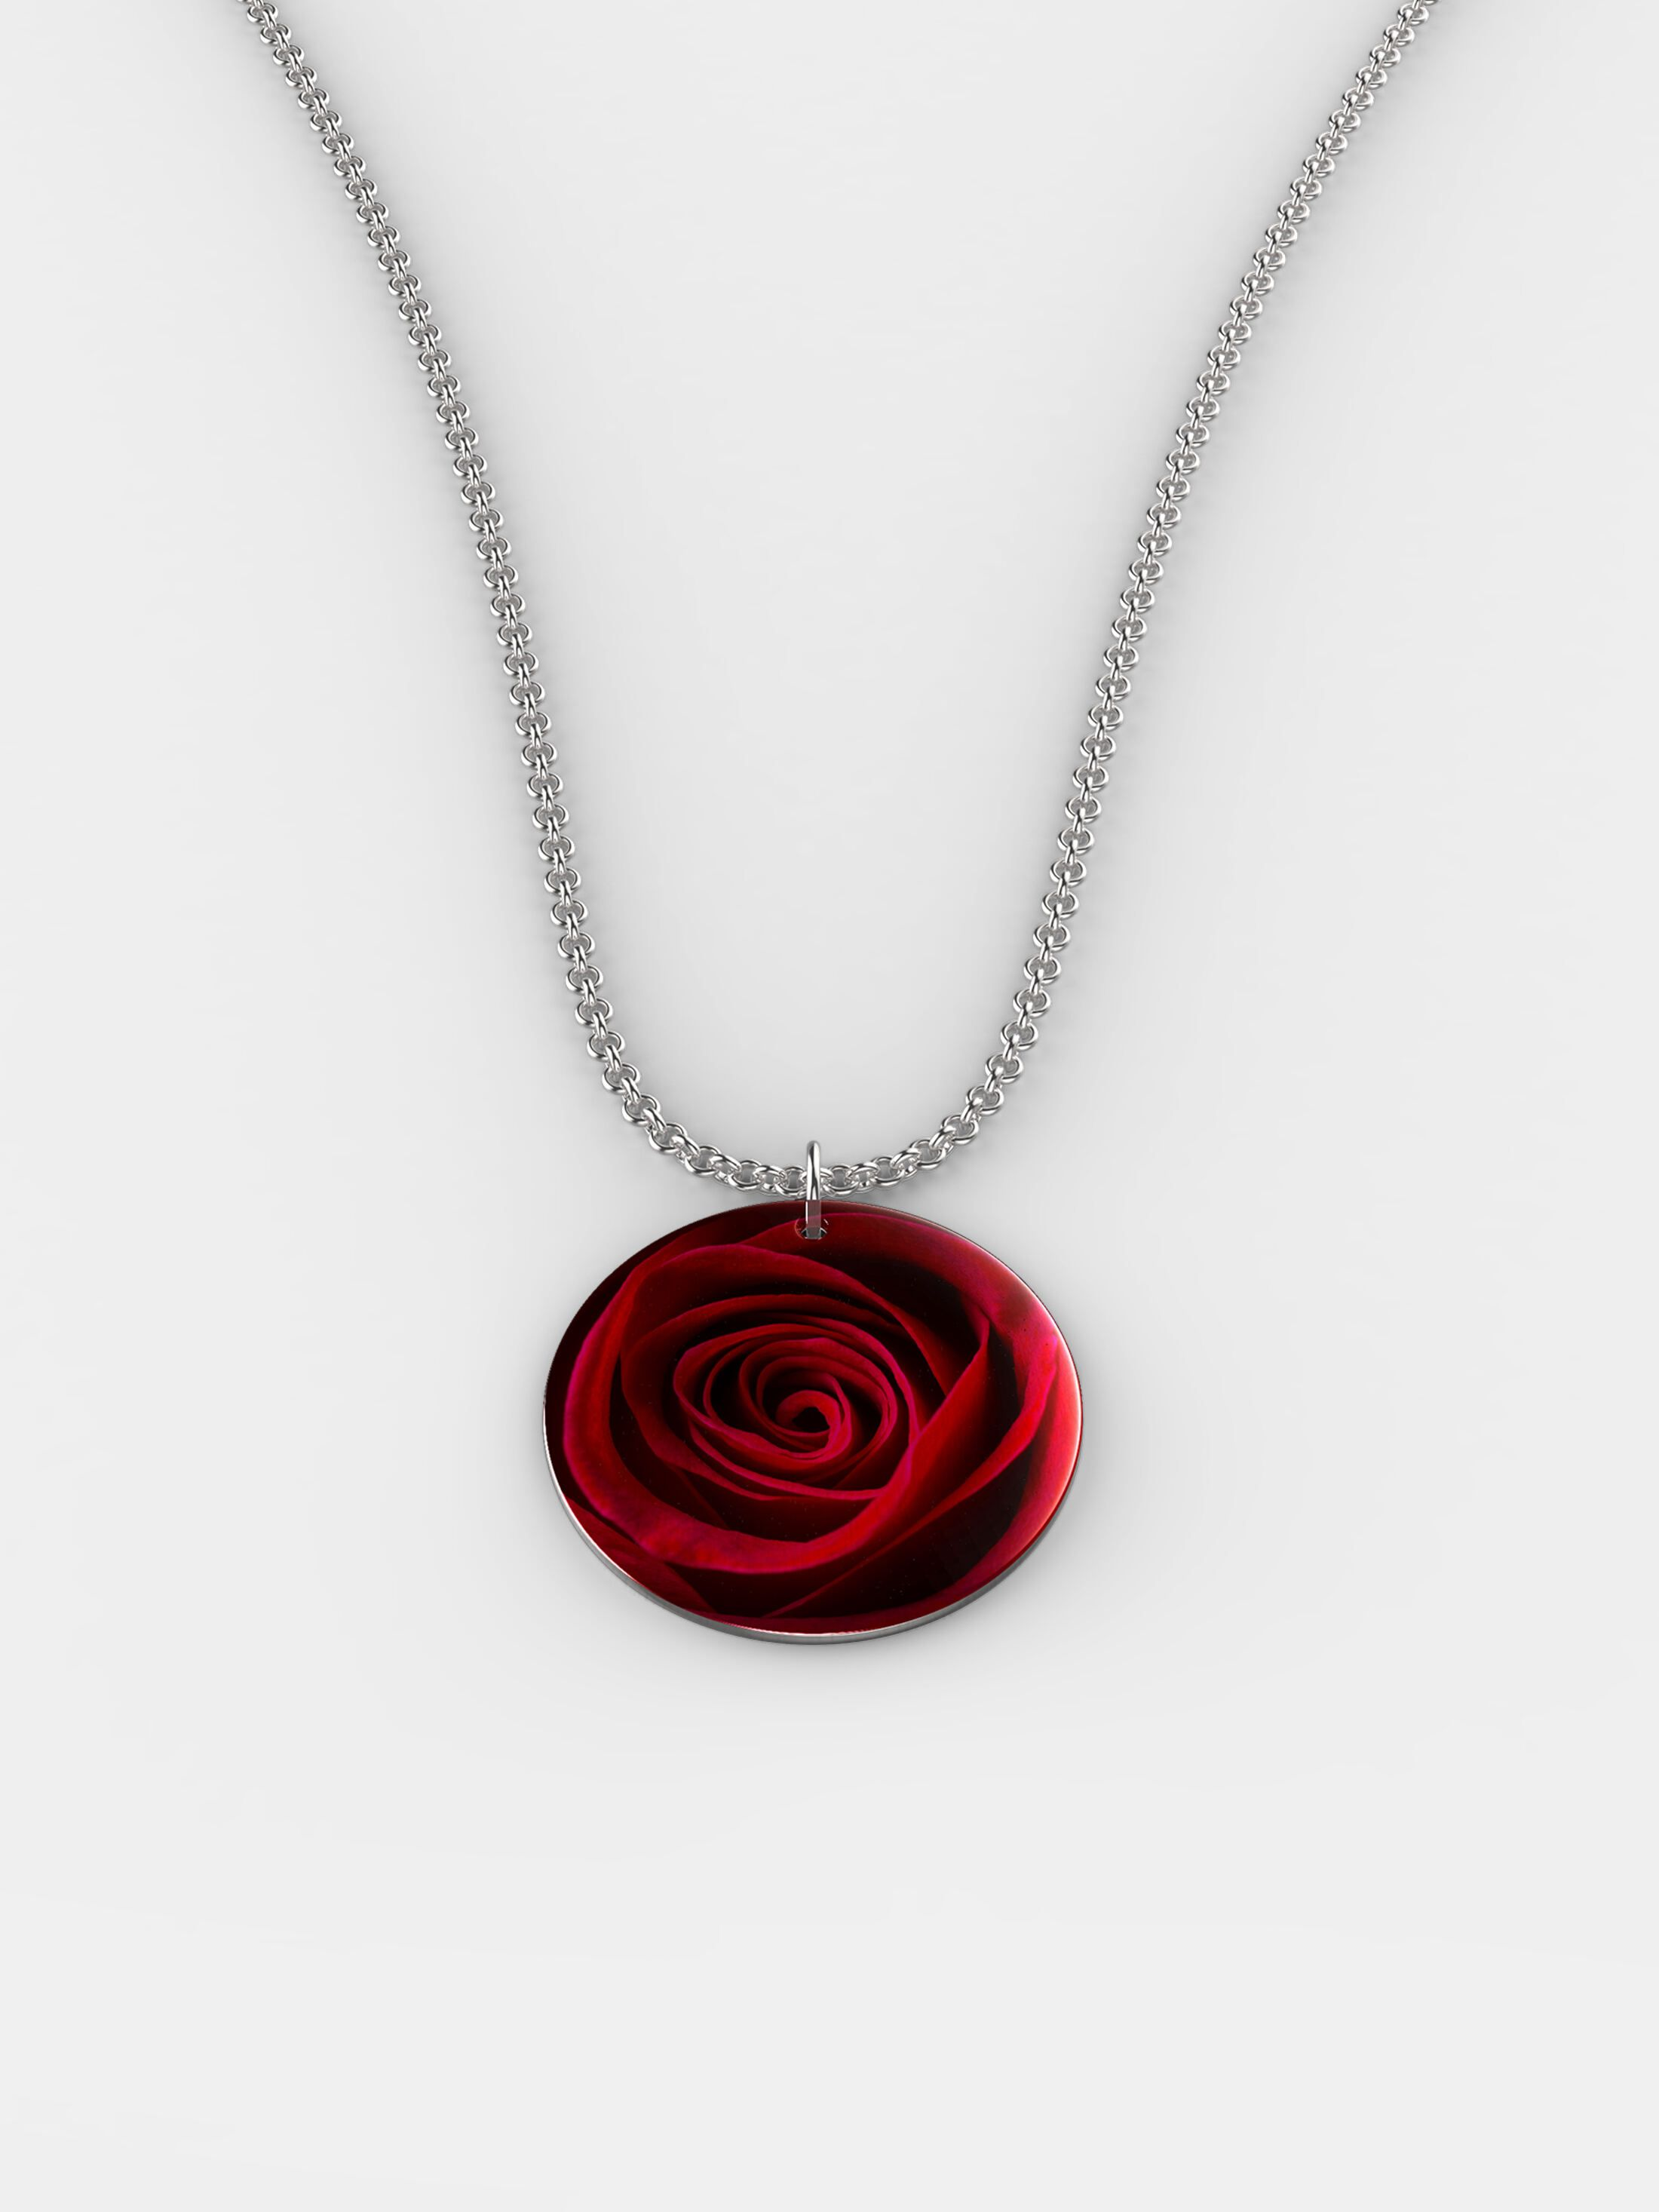 Bespoke silver necklace IE